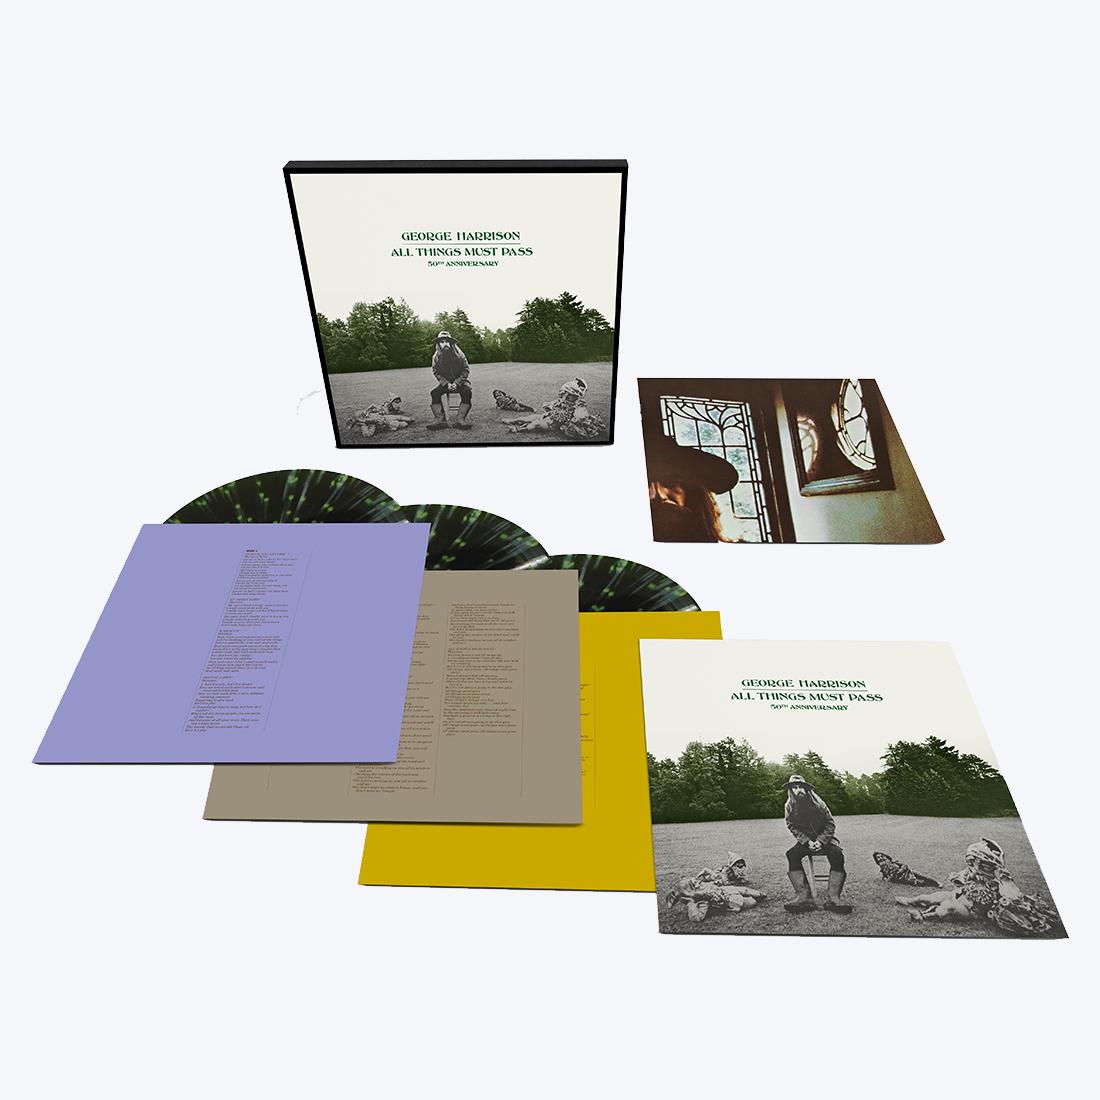 All Things Must Pass: Exclusive Green + Black Splatter Vinyl 3LP